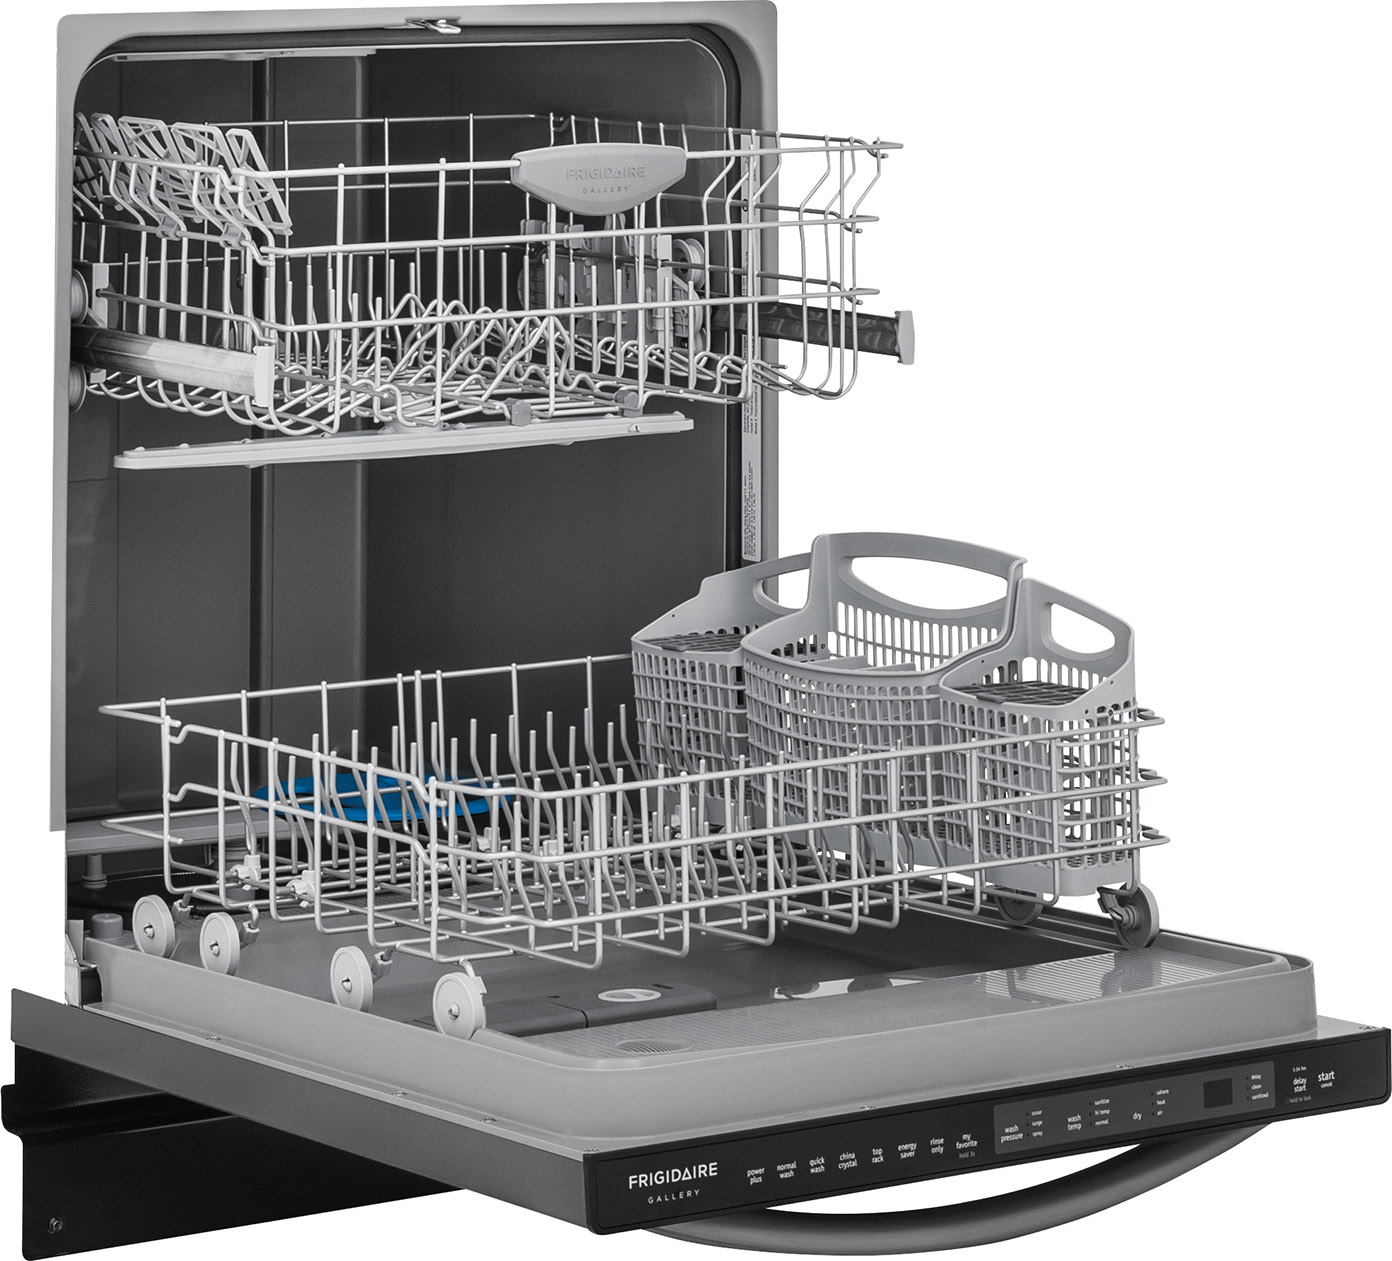 Frigidaire Gallery Dishwasher - Open